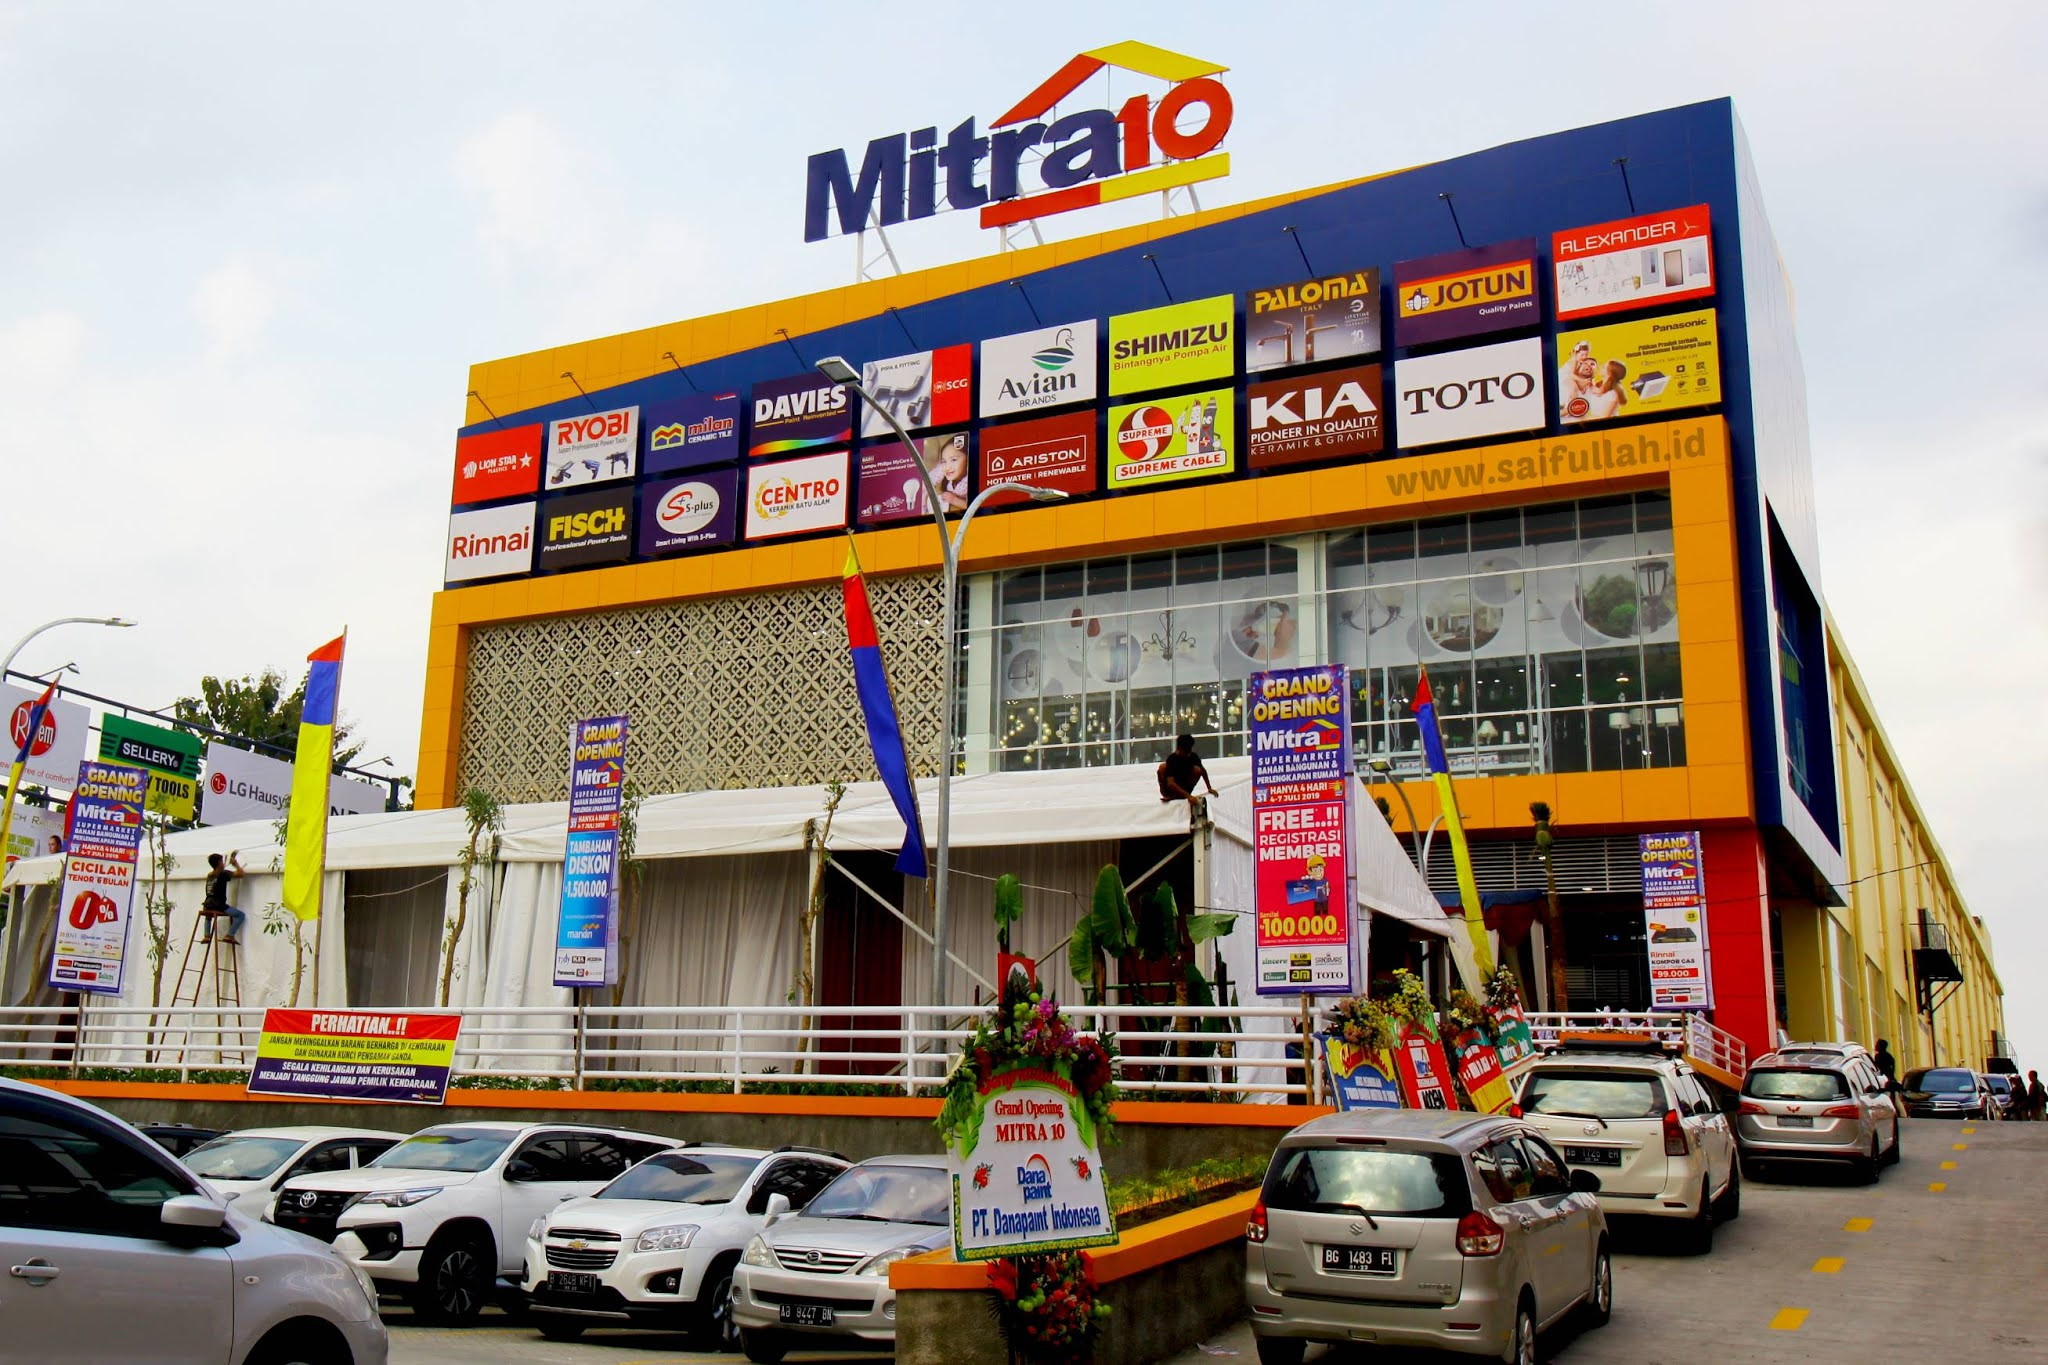 Lowongan Kerja Staff Warehouse Mitra10 Kedungdoro Surabaya